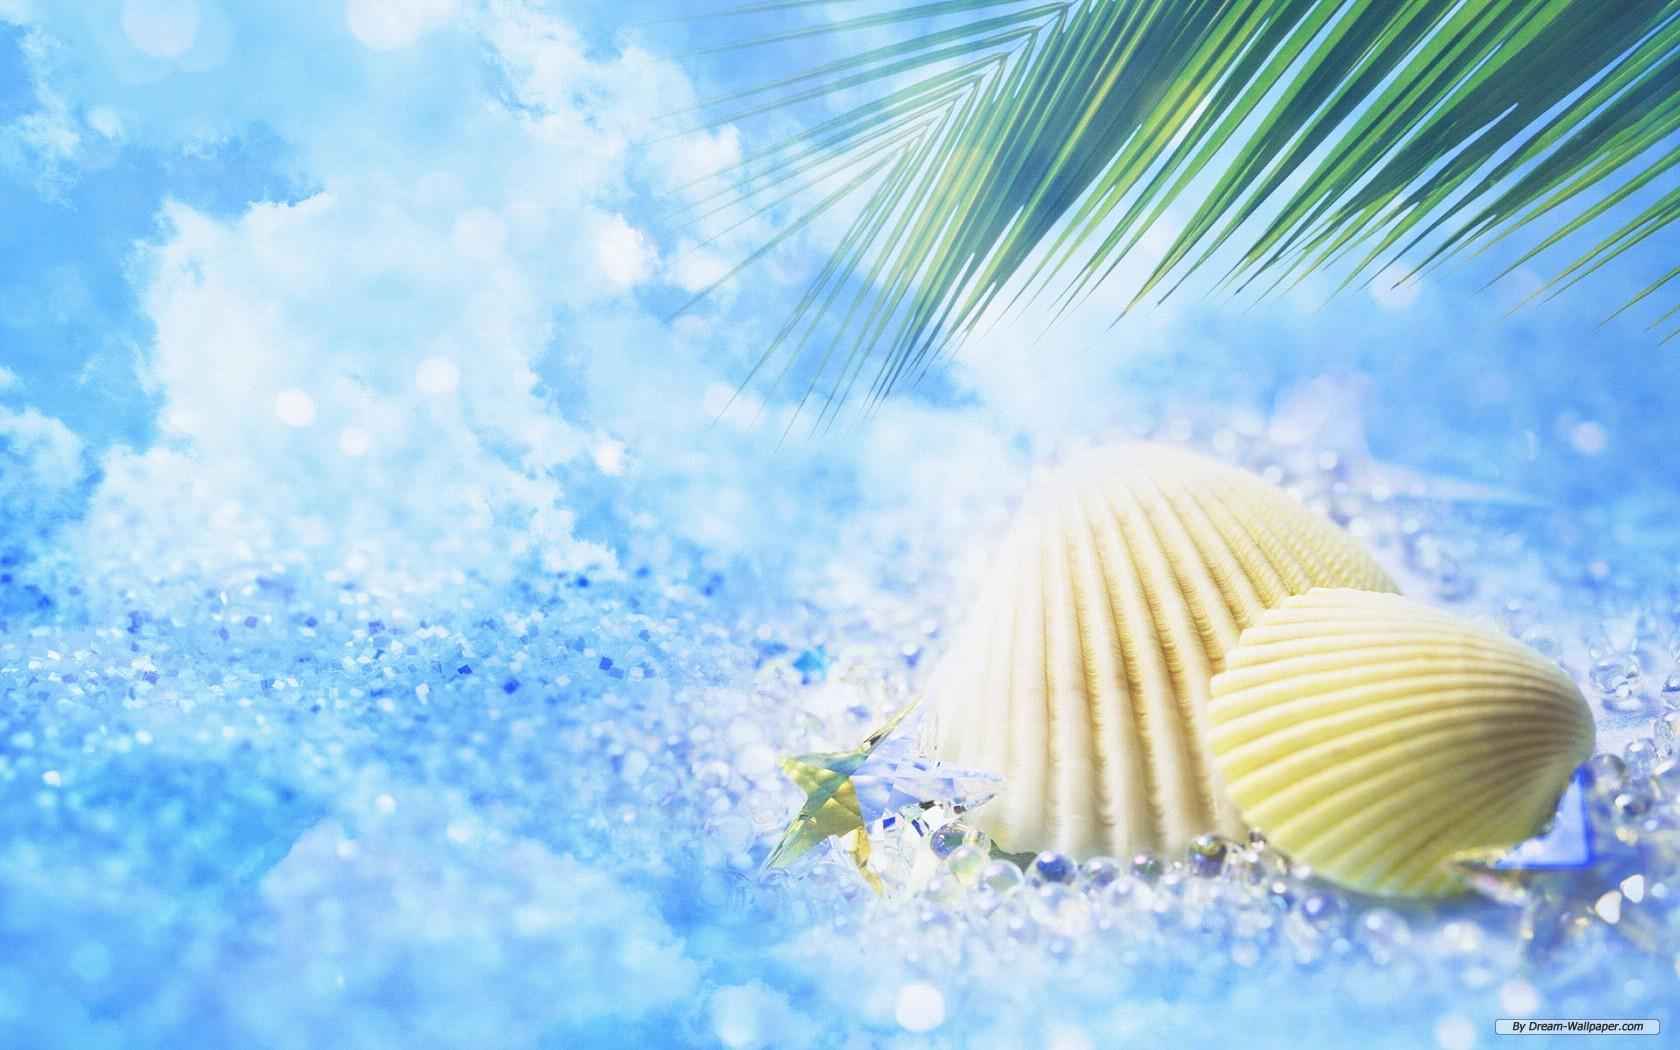 Free Summer Desktop Backgrounds - WallpaperSafari